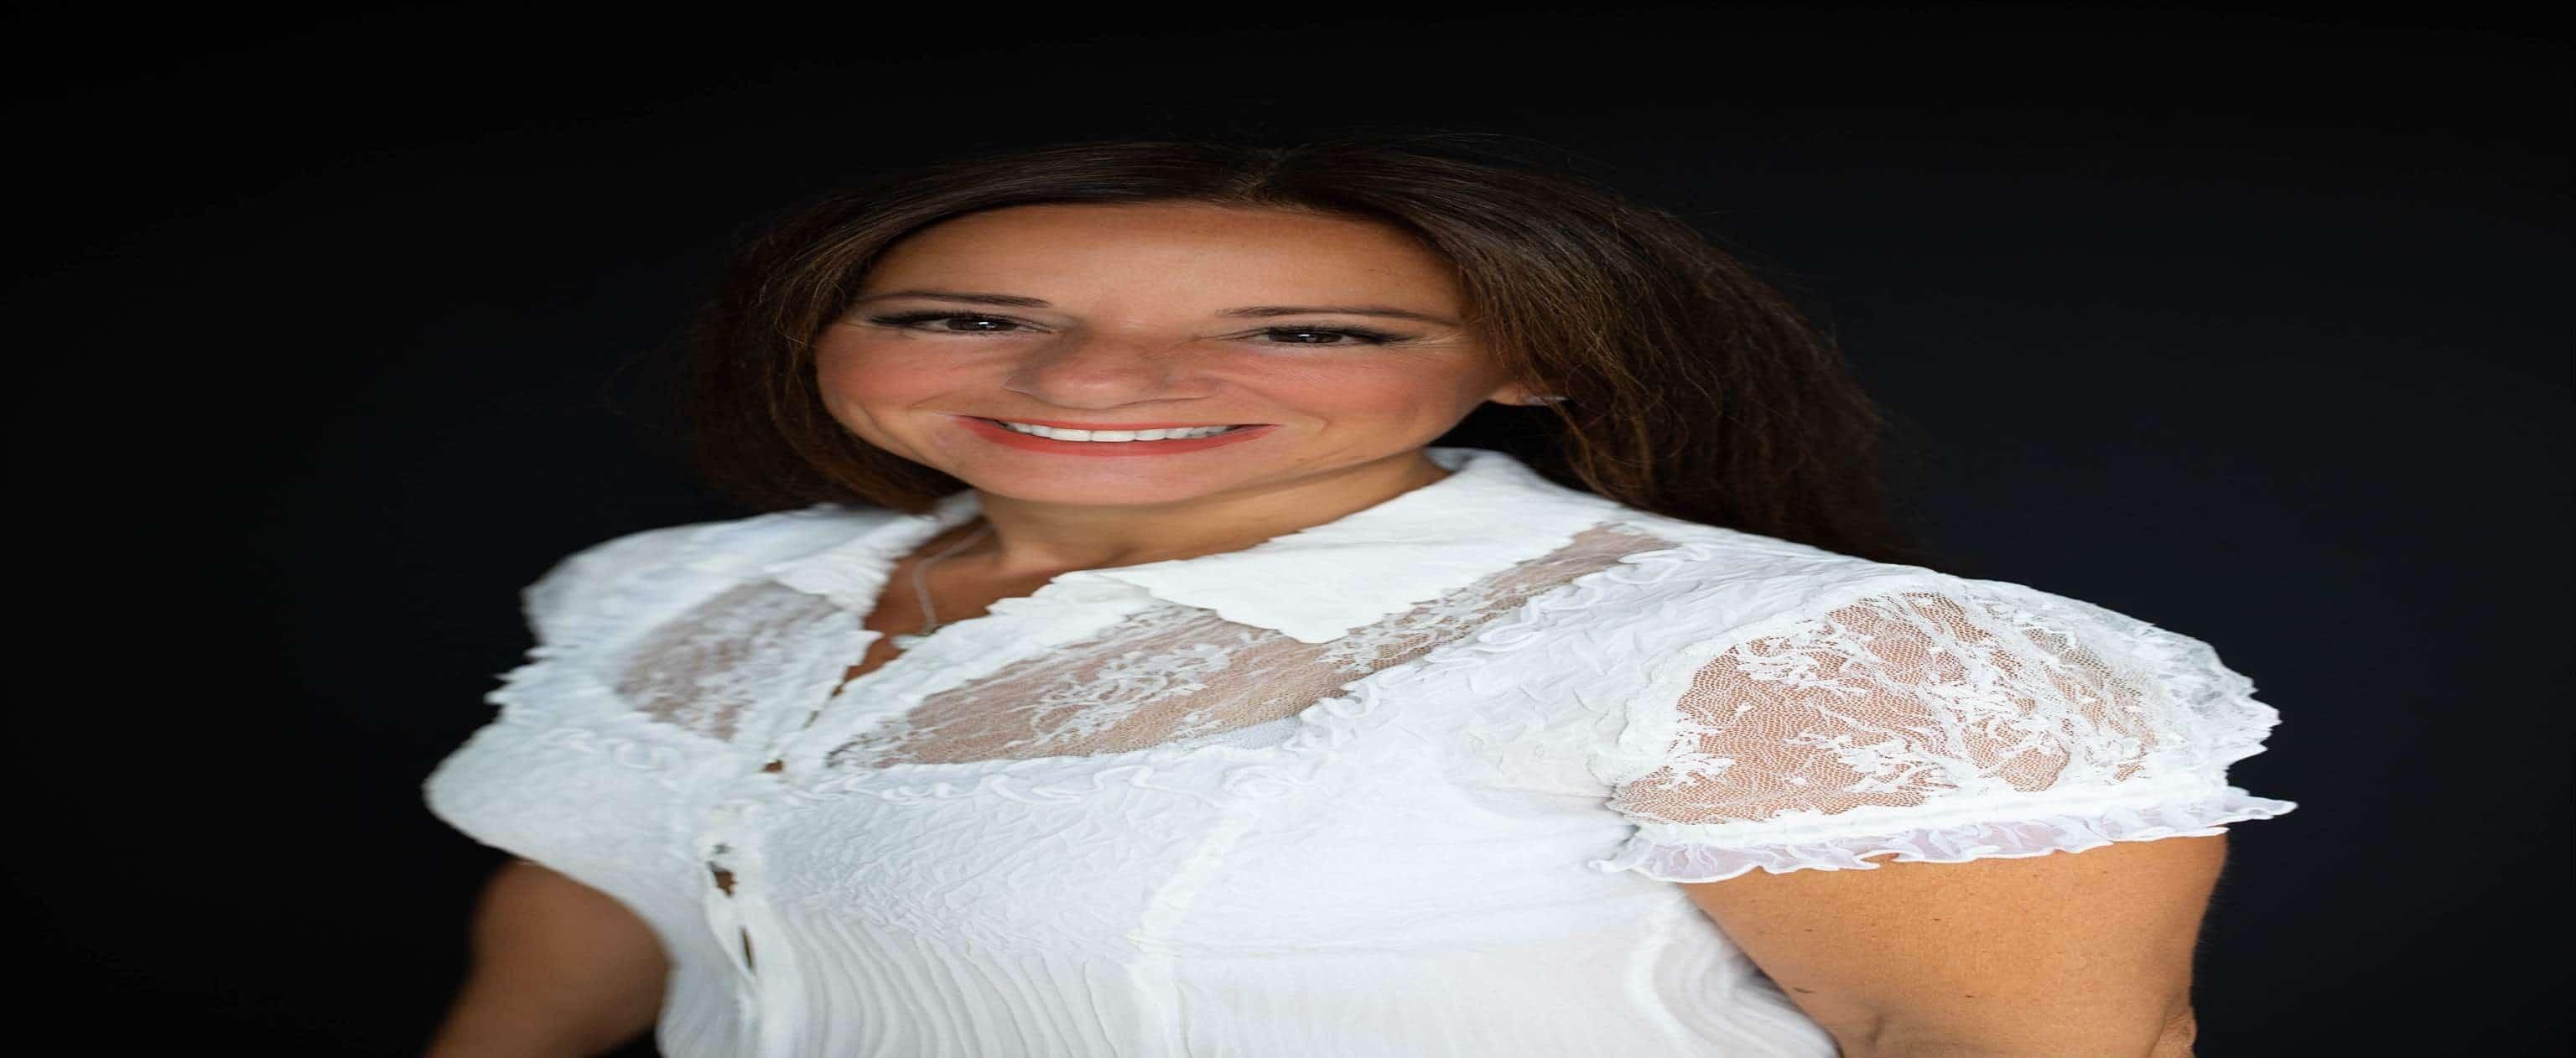 Rosanna Zingales-Lopez